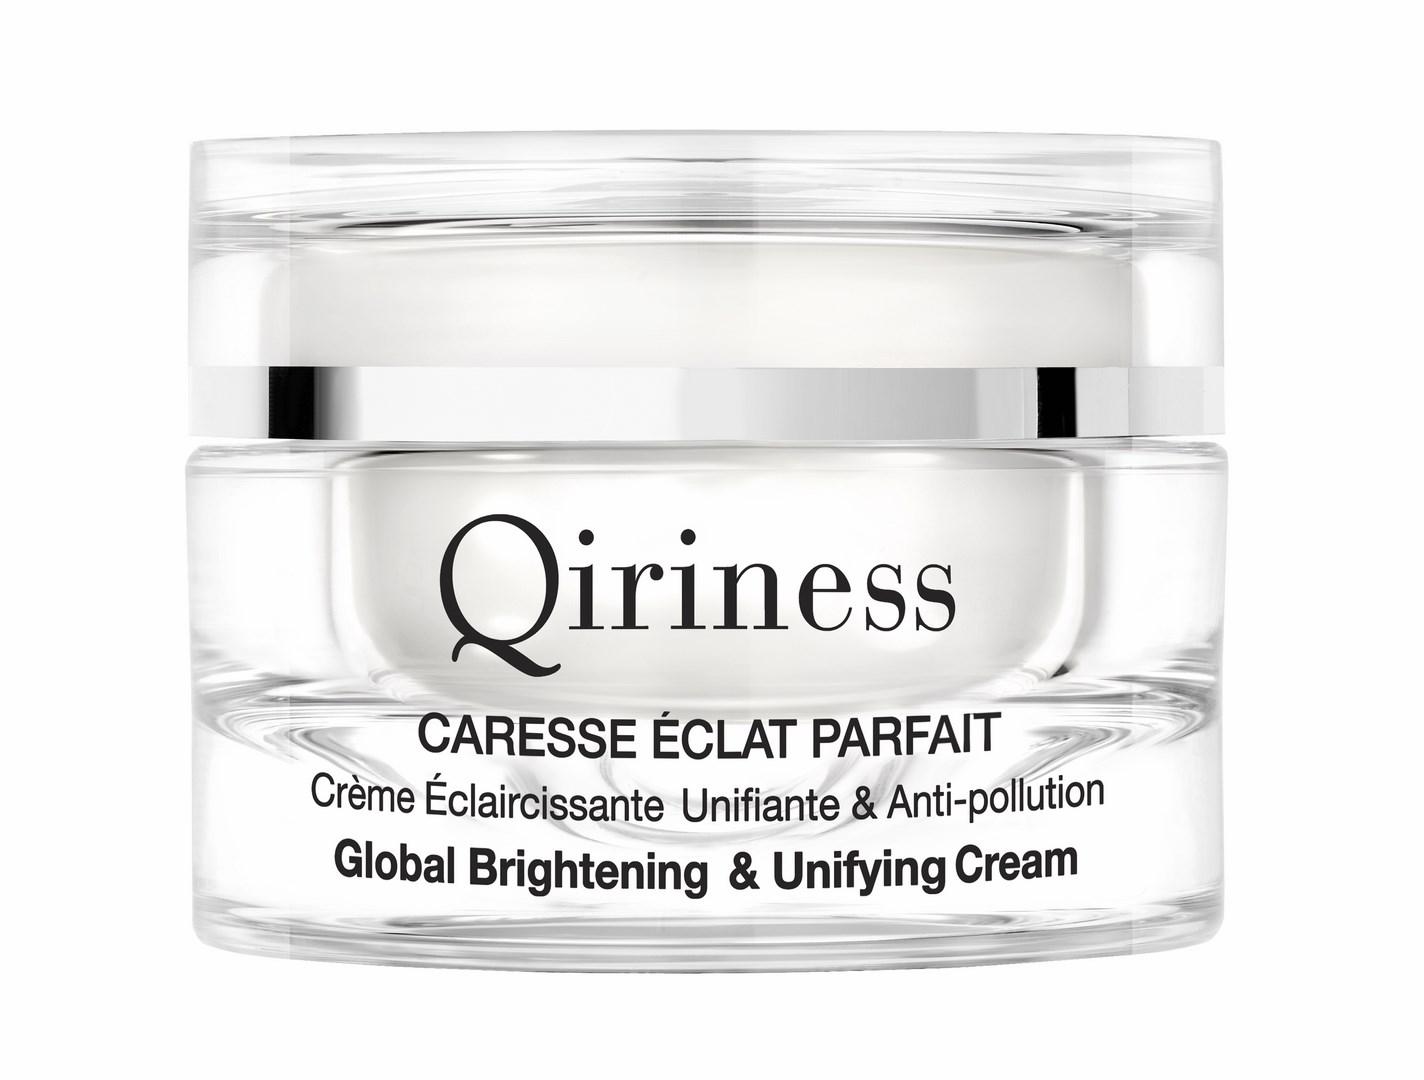 Caresse Eclat Parfait - QIRINESS (Copier)